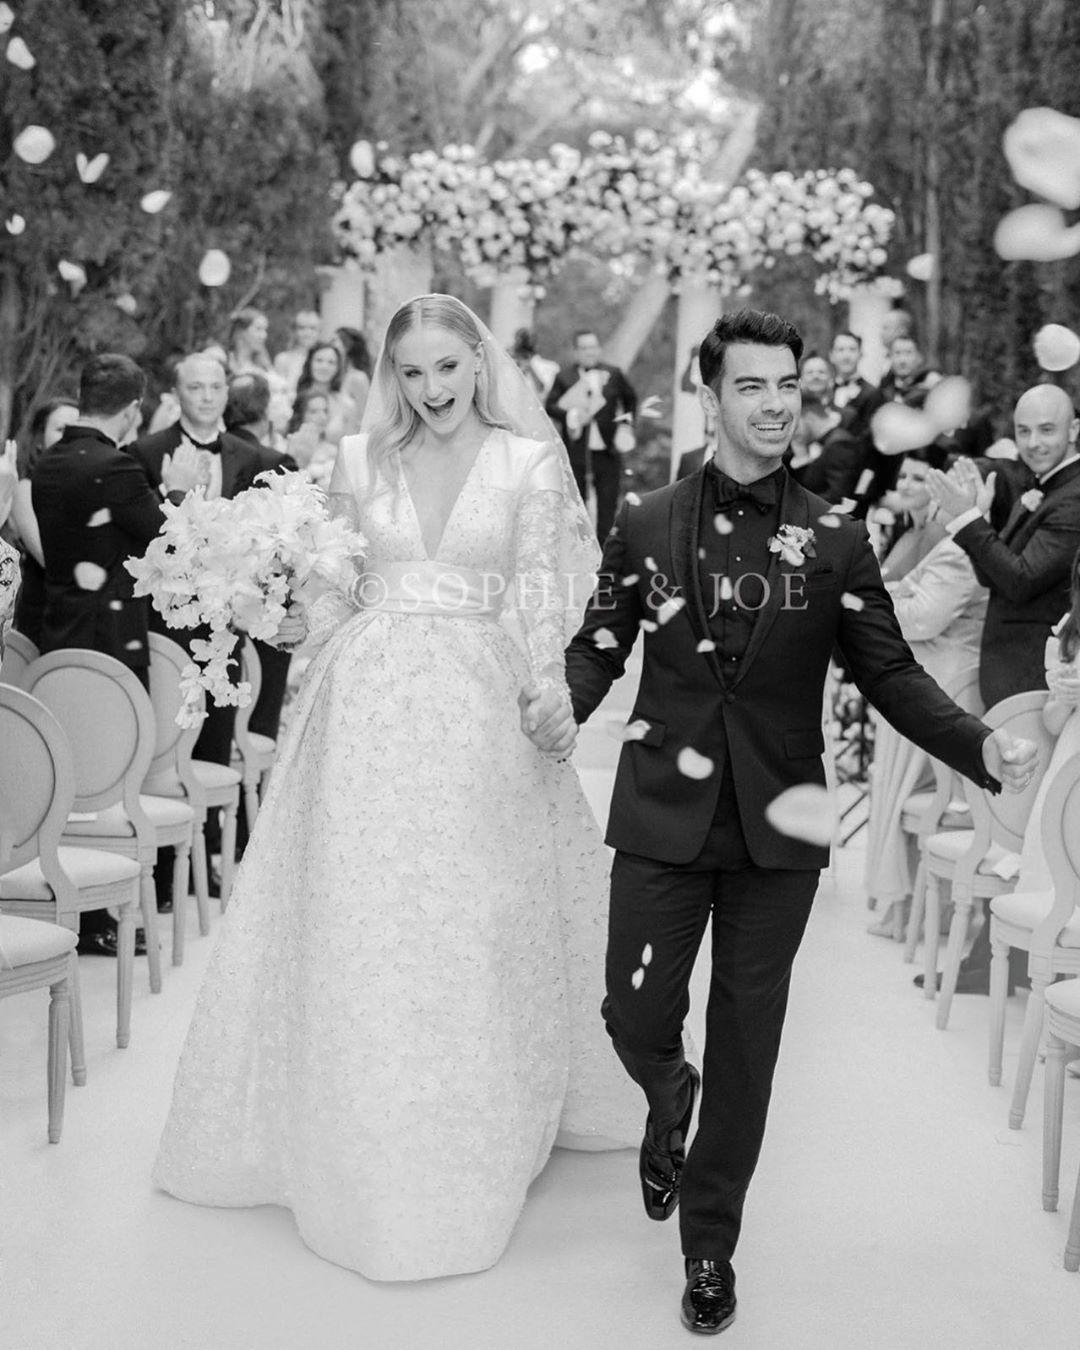 Luxury White Wedding Fishnet Hold Up Stockings With LaceTop Bridal Princessa 11